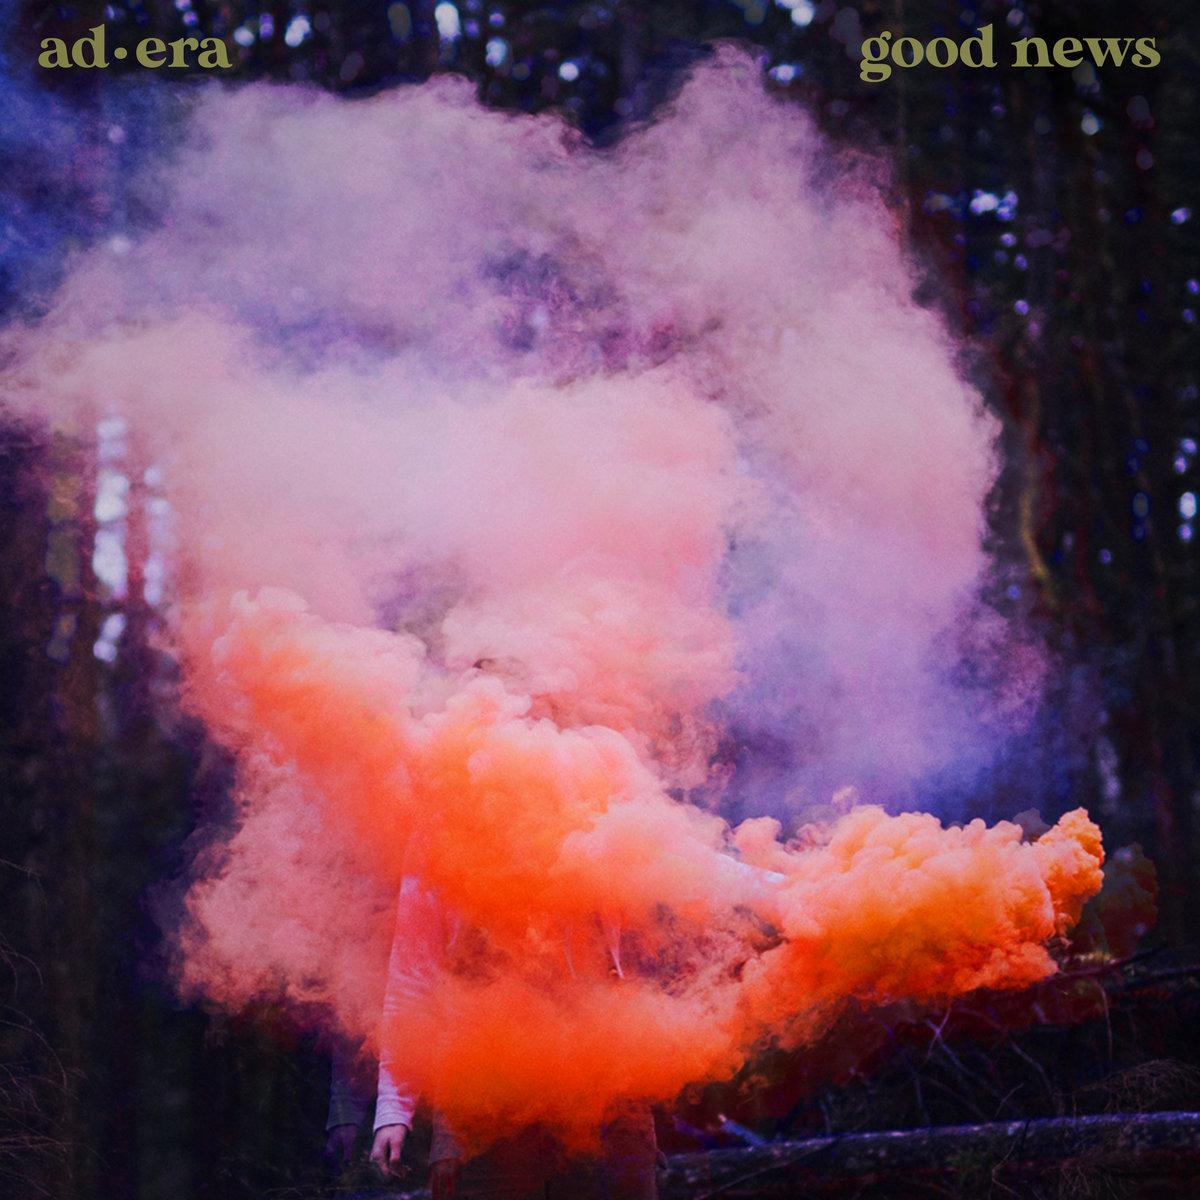 Good News by ad•era